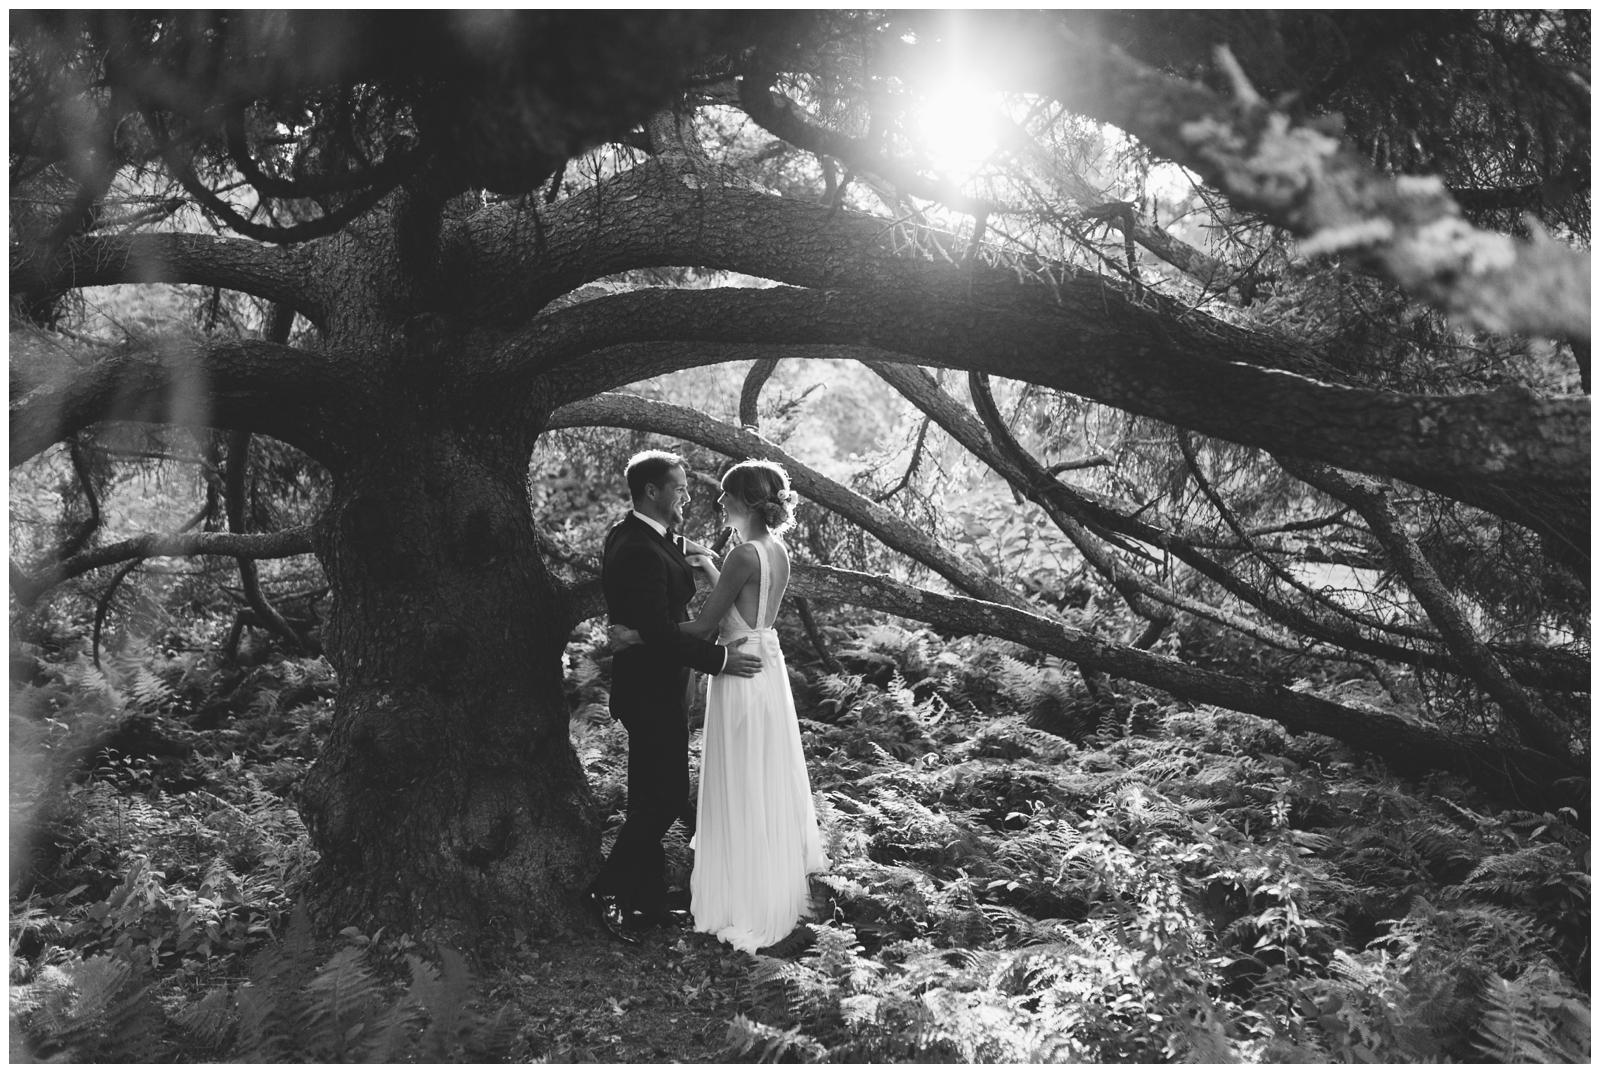 Moraine-Farm-wedding-Bailey-Q-Photo-Massachusetts-wedding-photpgrapher-102.jpg